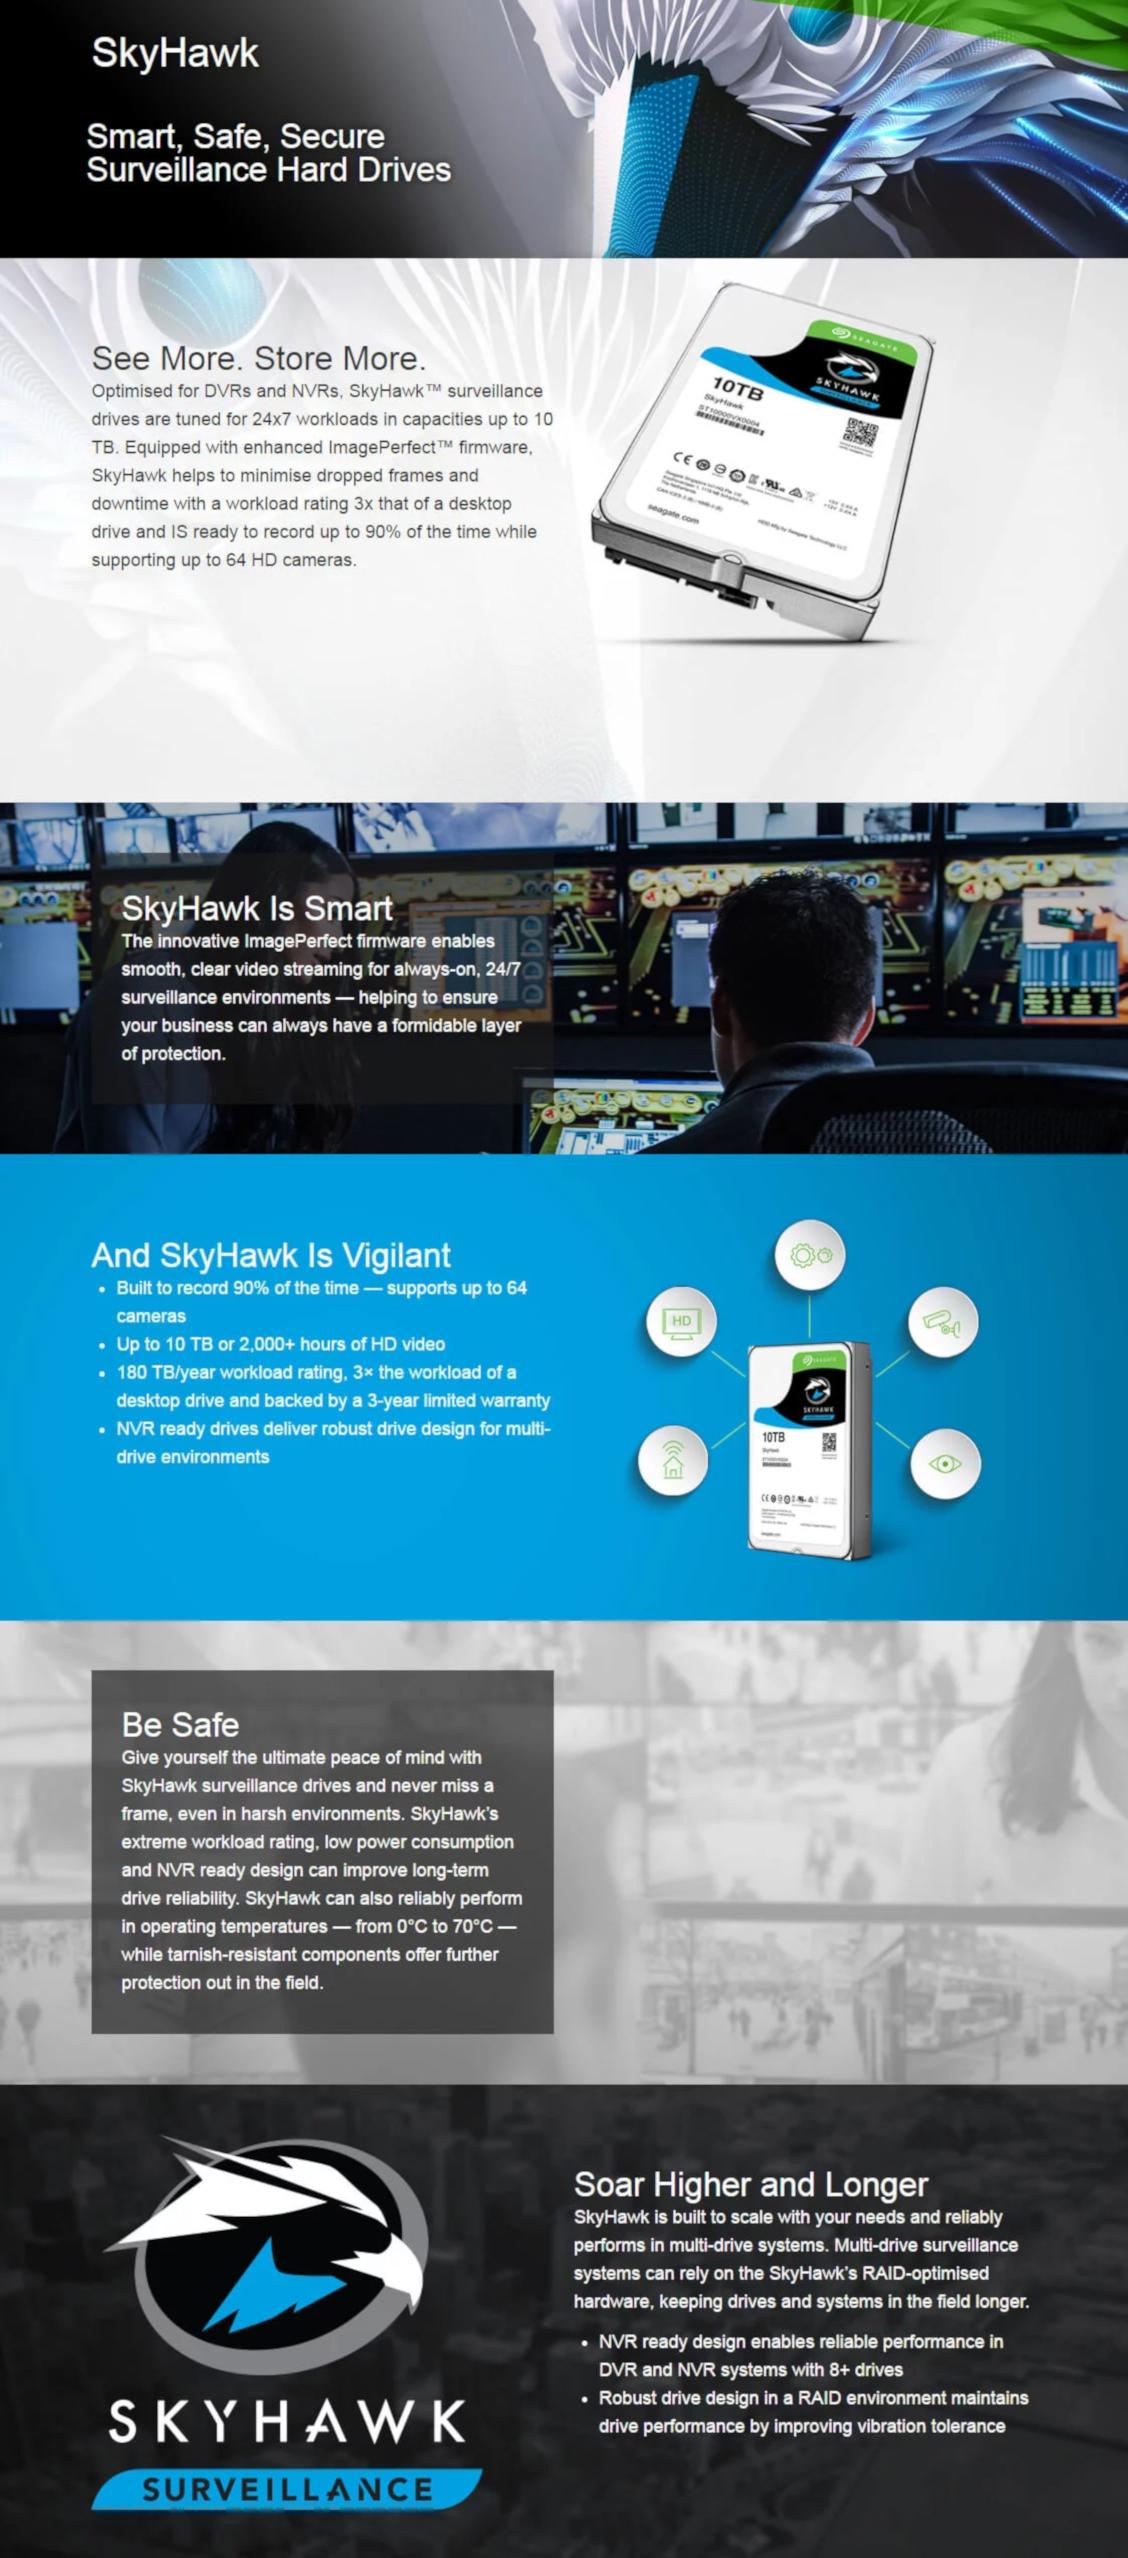 Seagate SkyHawk Surveillance 3 5